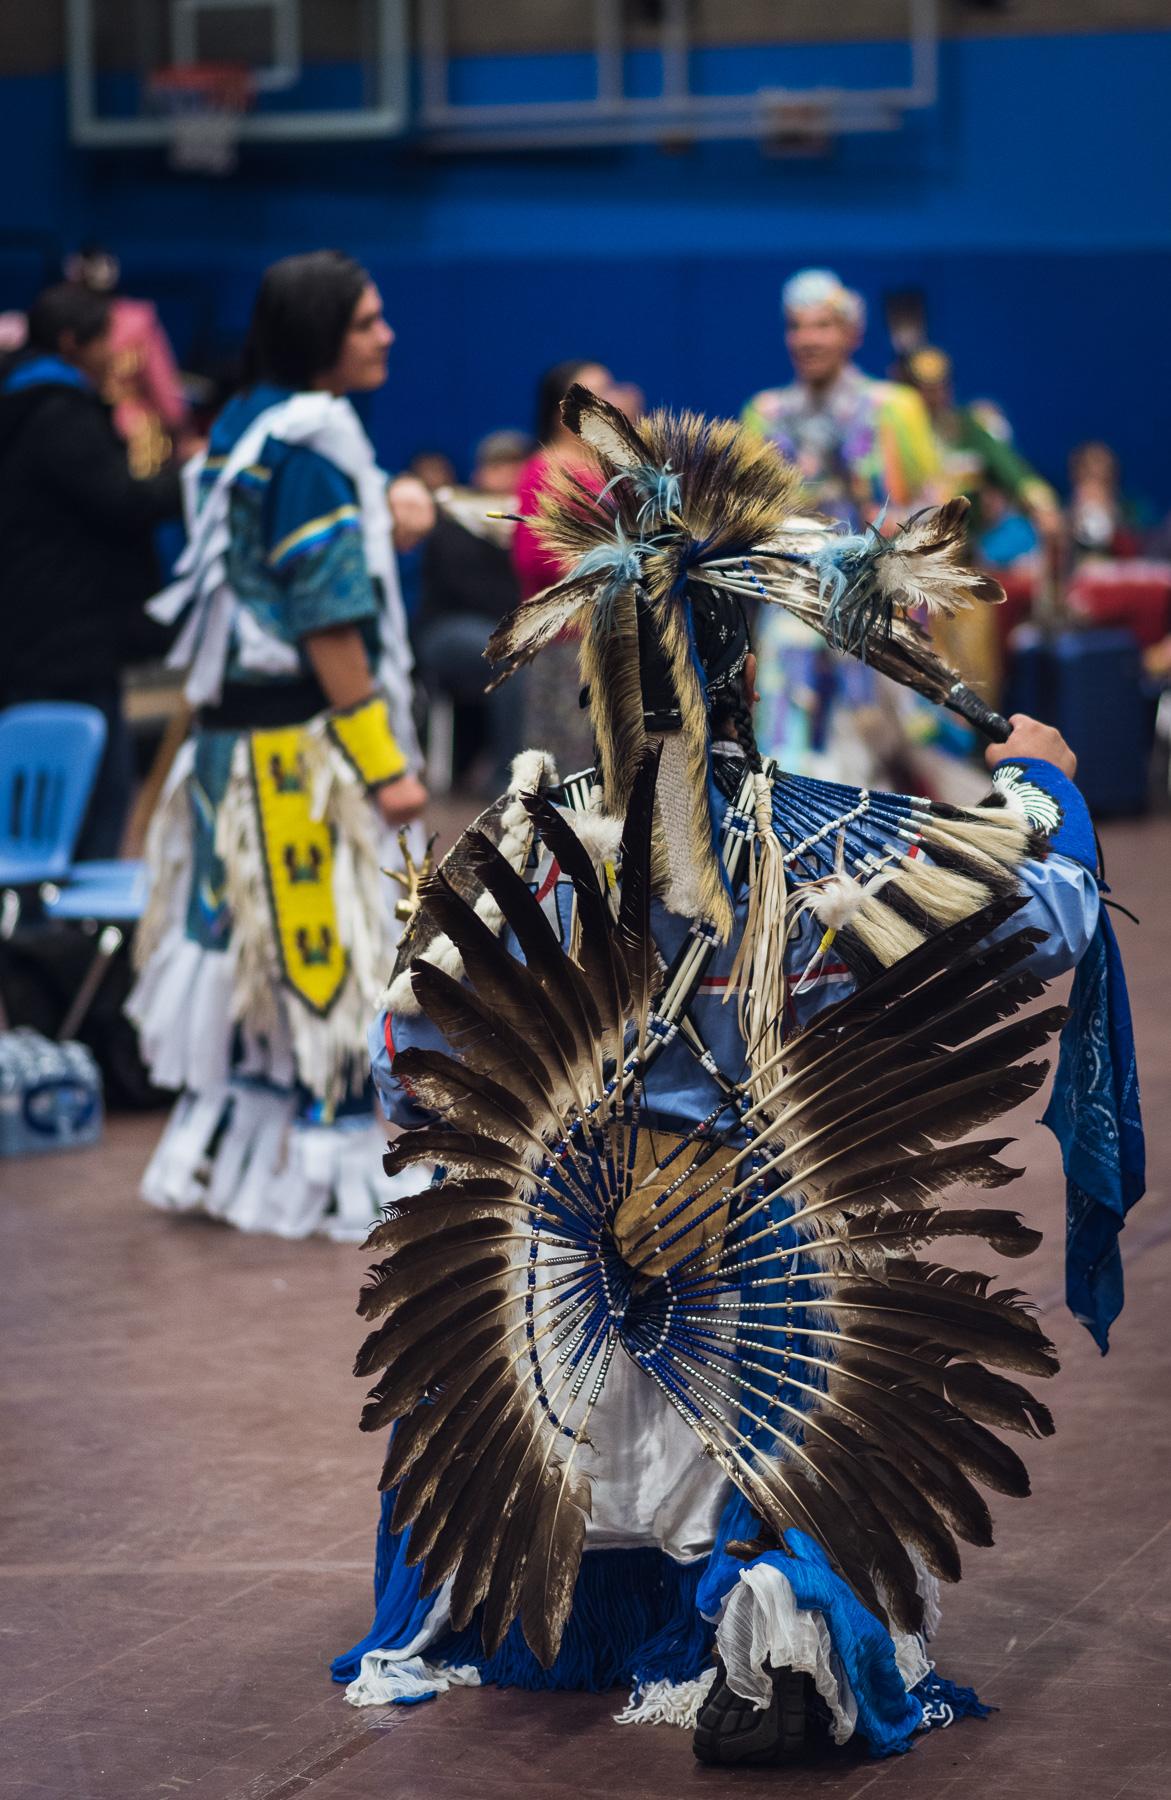 31st-Annual-LUNSA-Powwow-Blog-67.jpg